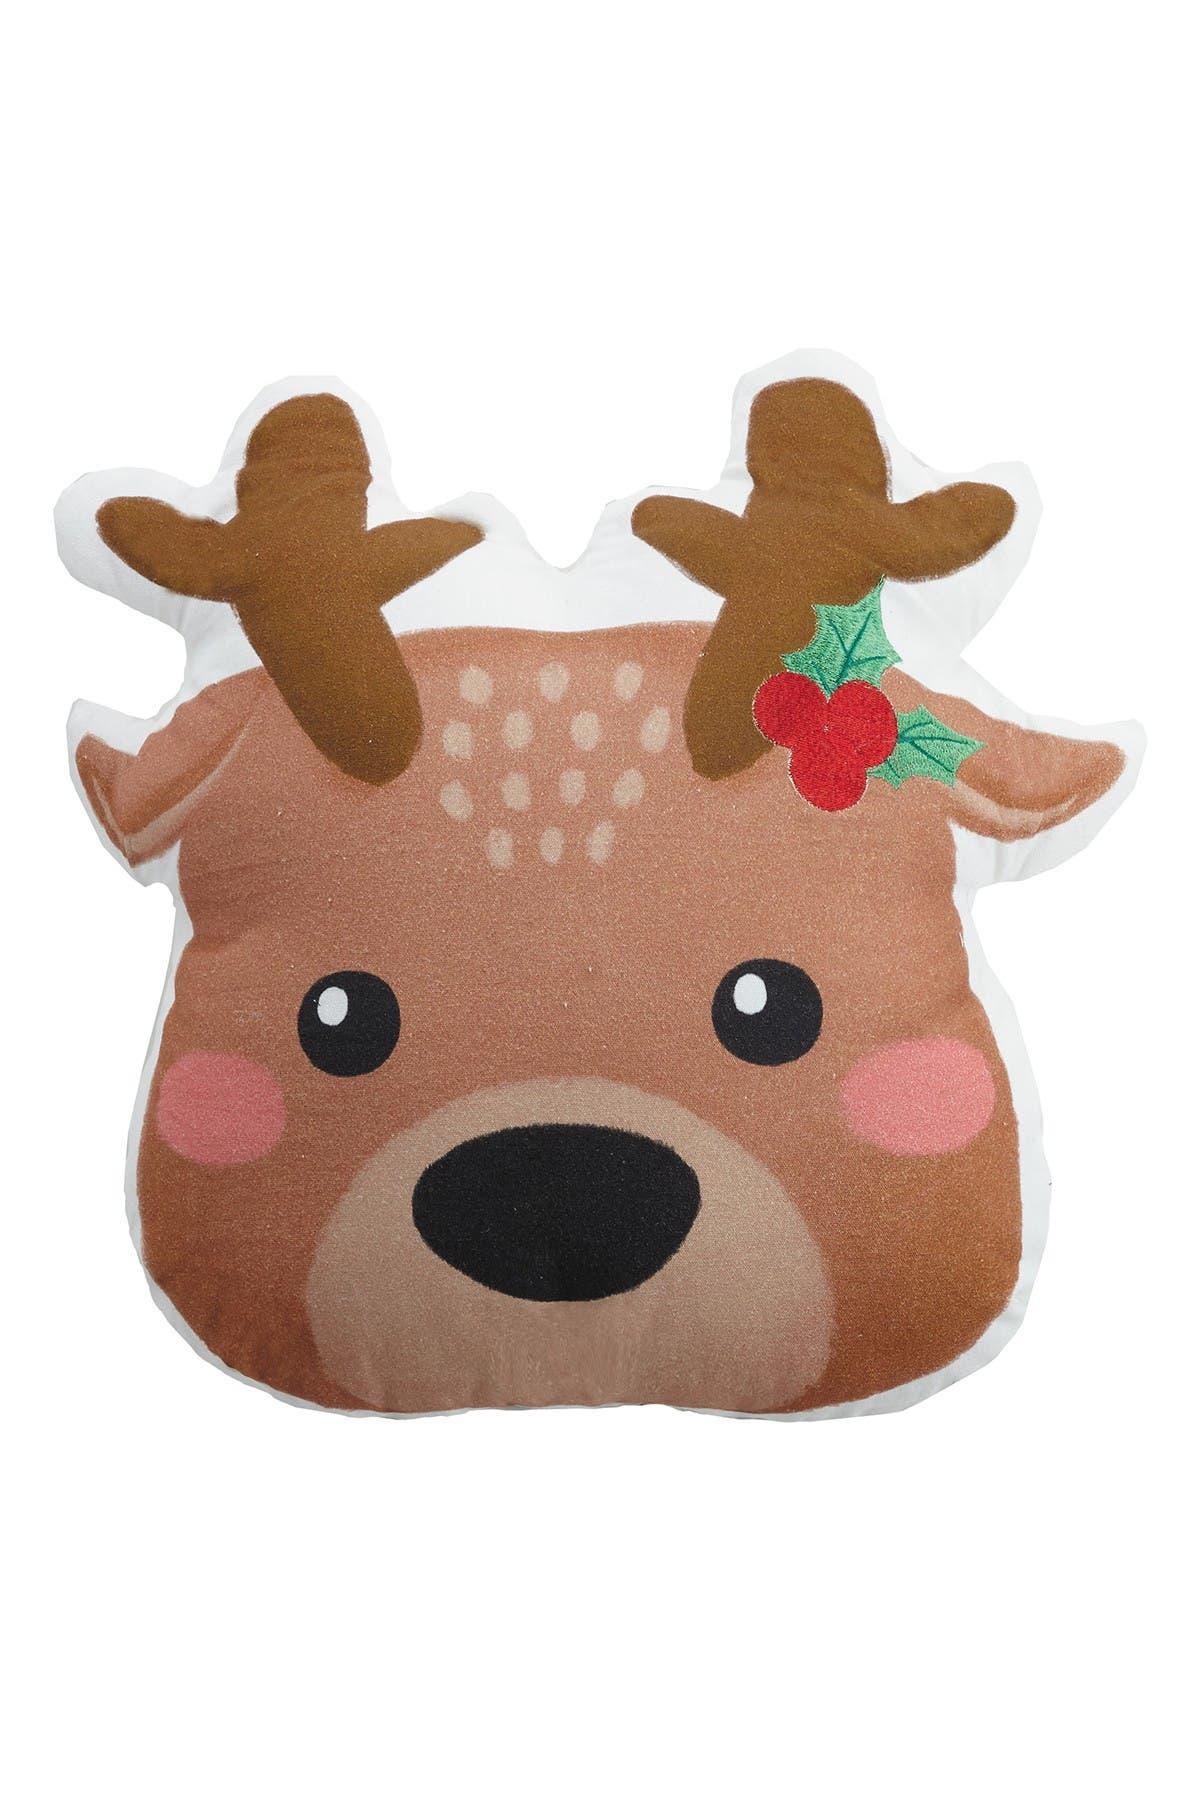 Image of Peking Handicraft Multi Reindeer Shaped Print Pillow